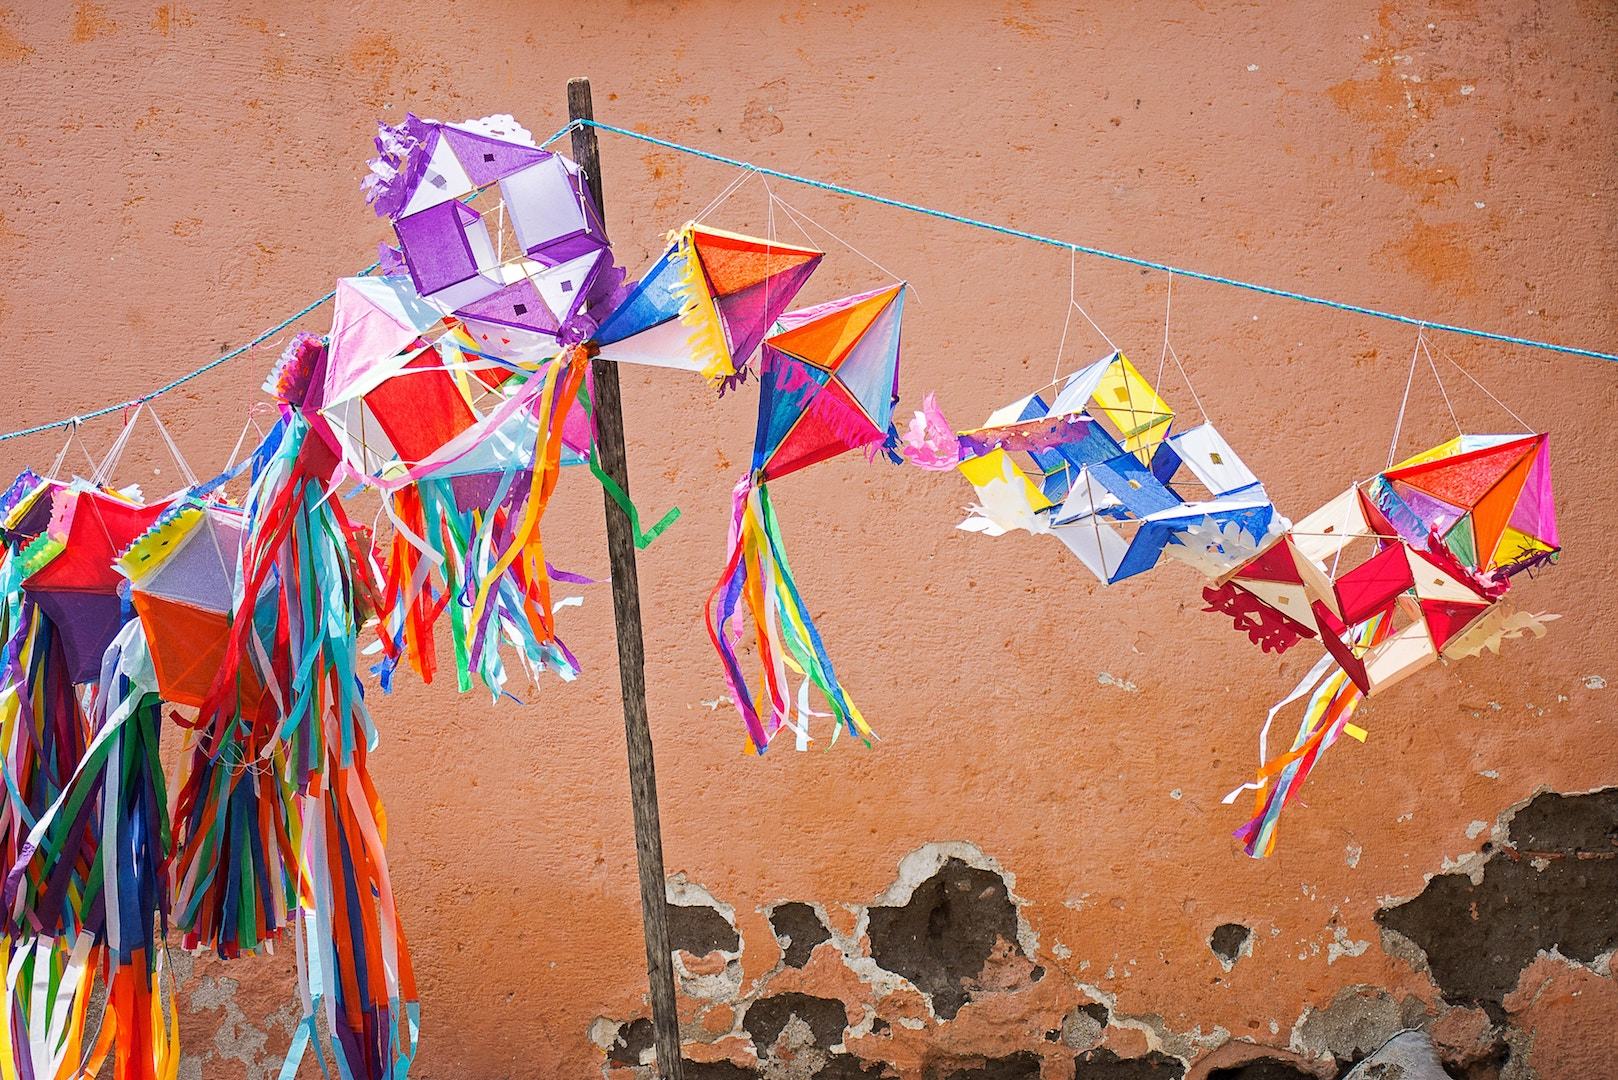 Streets of Guatemala